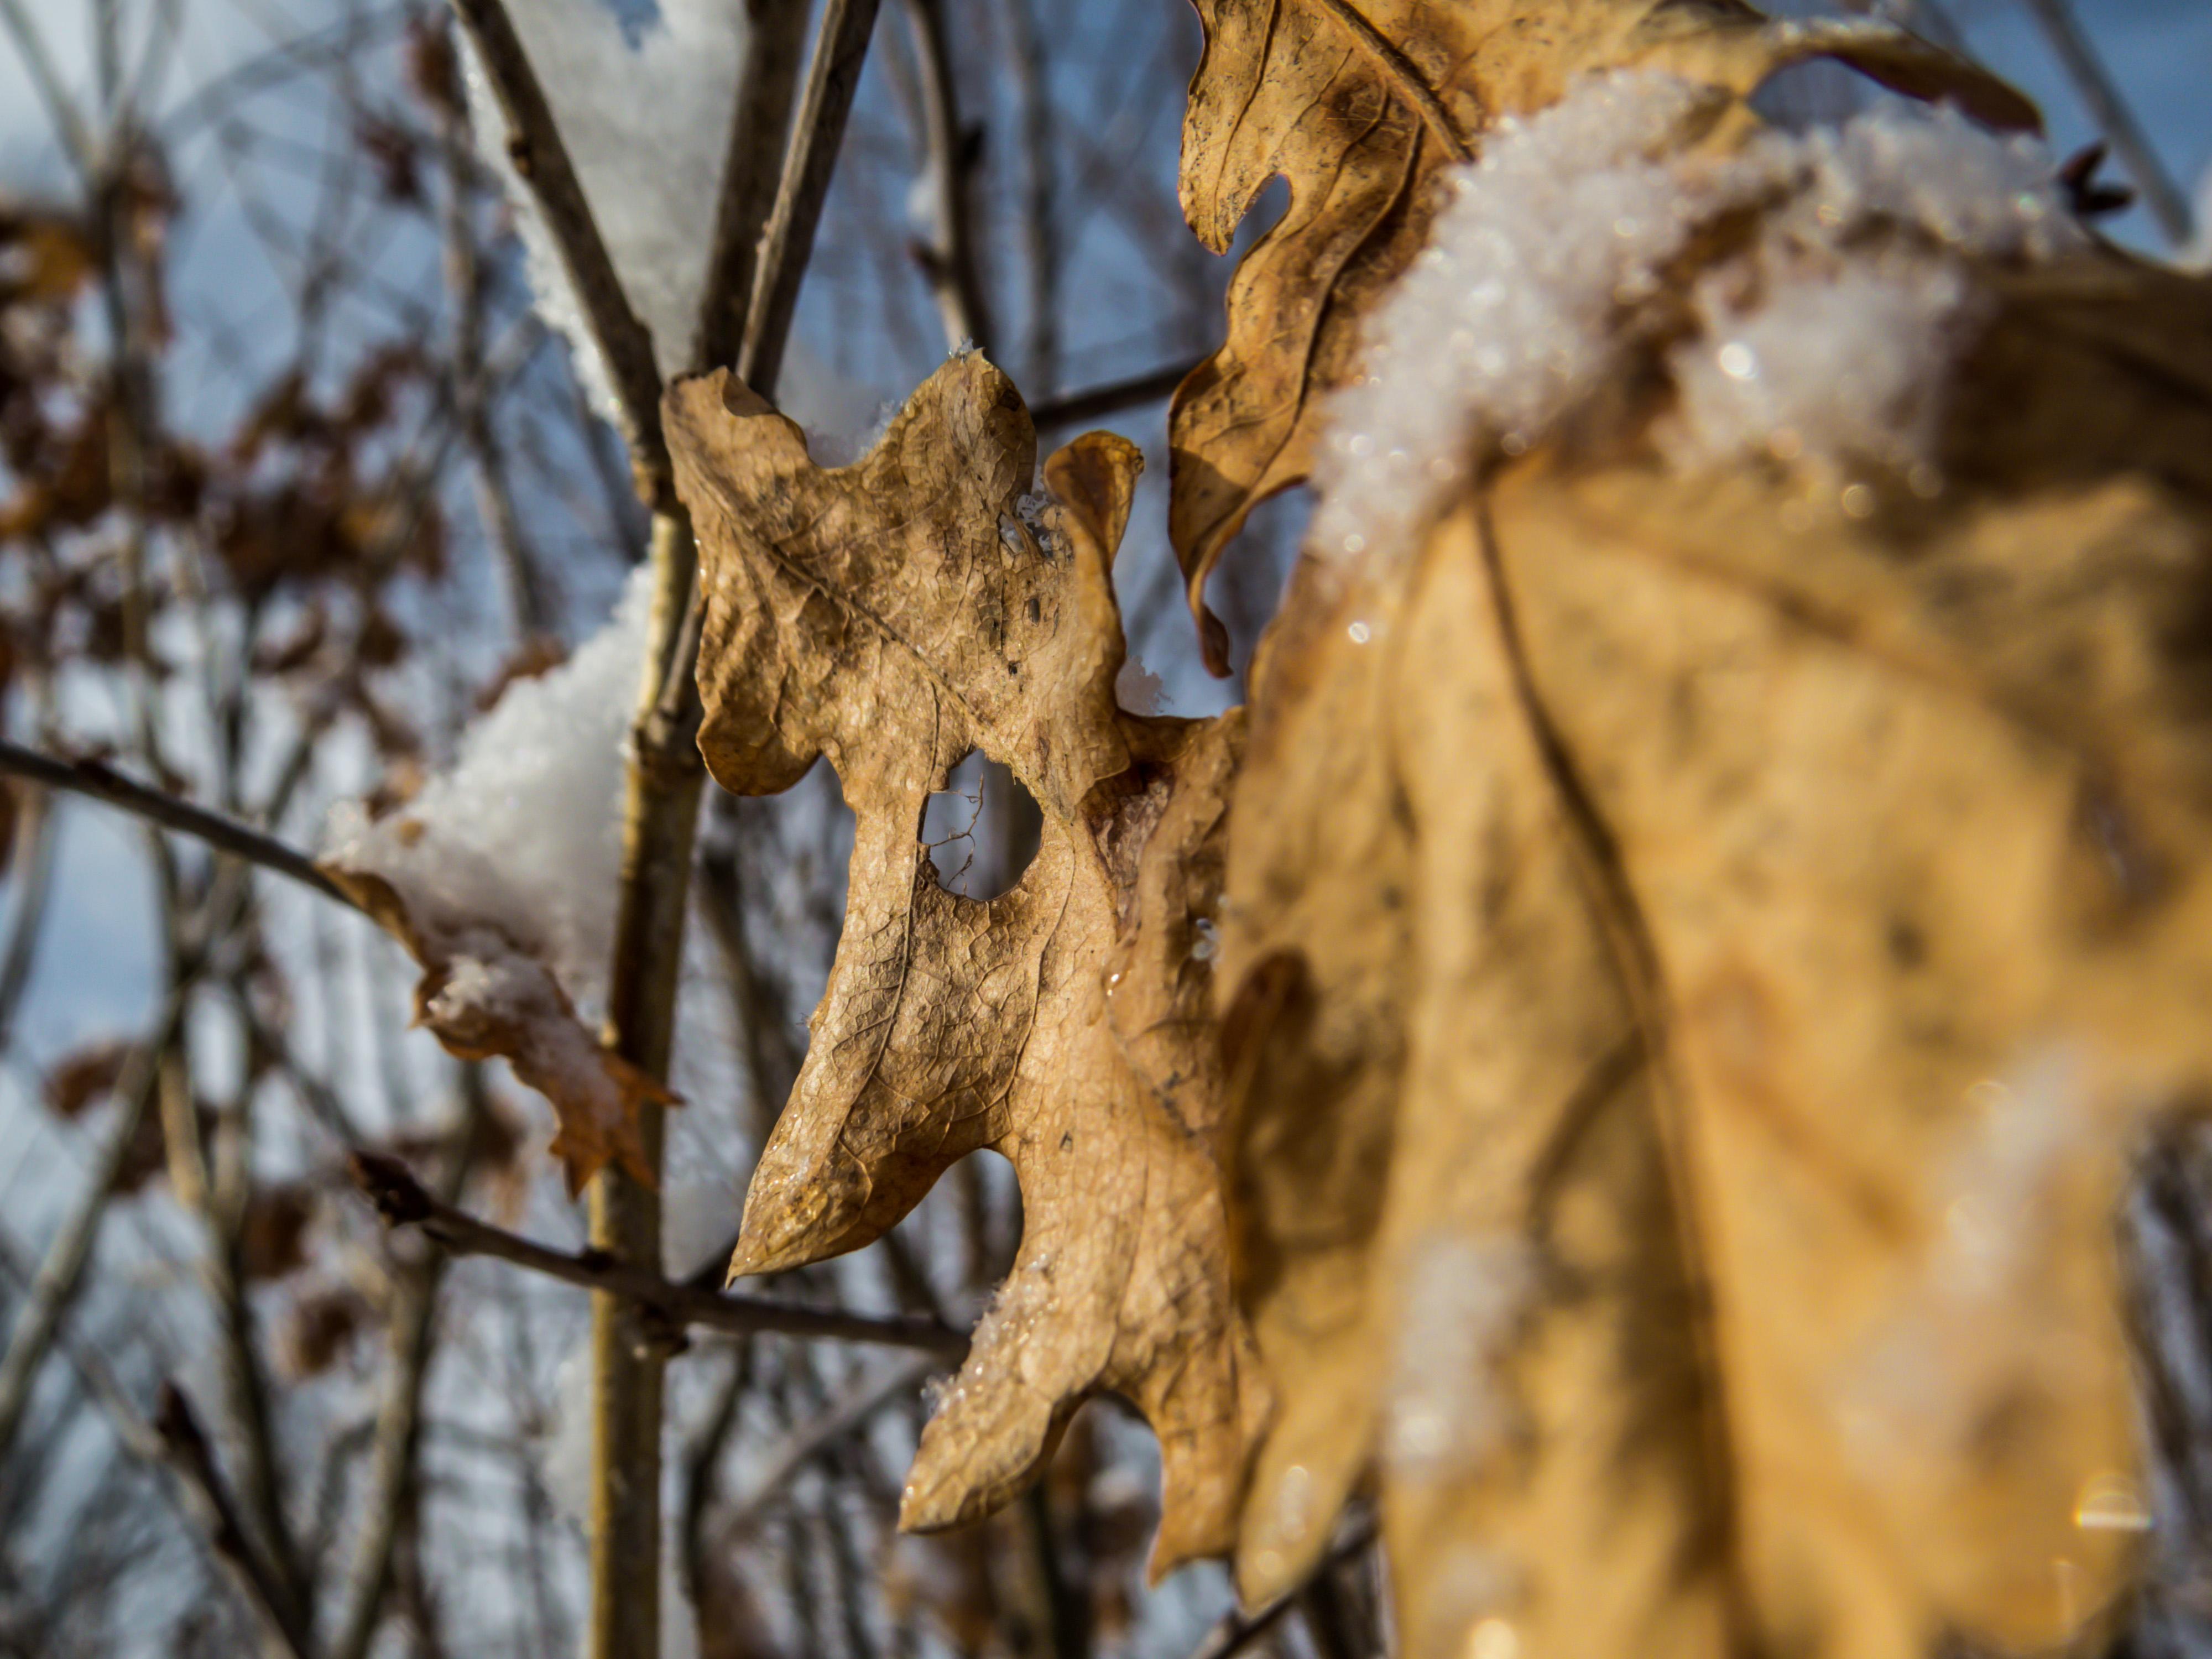 Last year oak leaves, Beautiful, Quit, Wild, Tree, HQ Photo